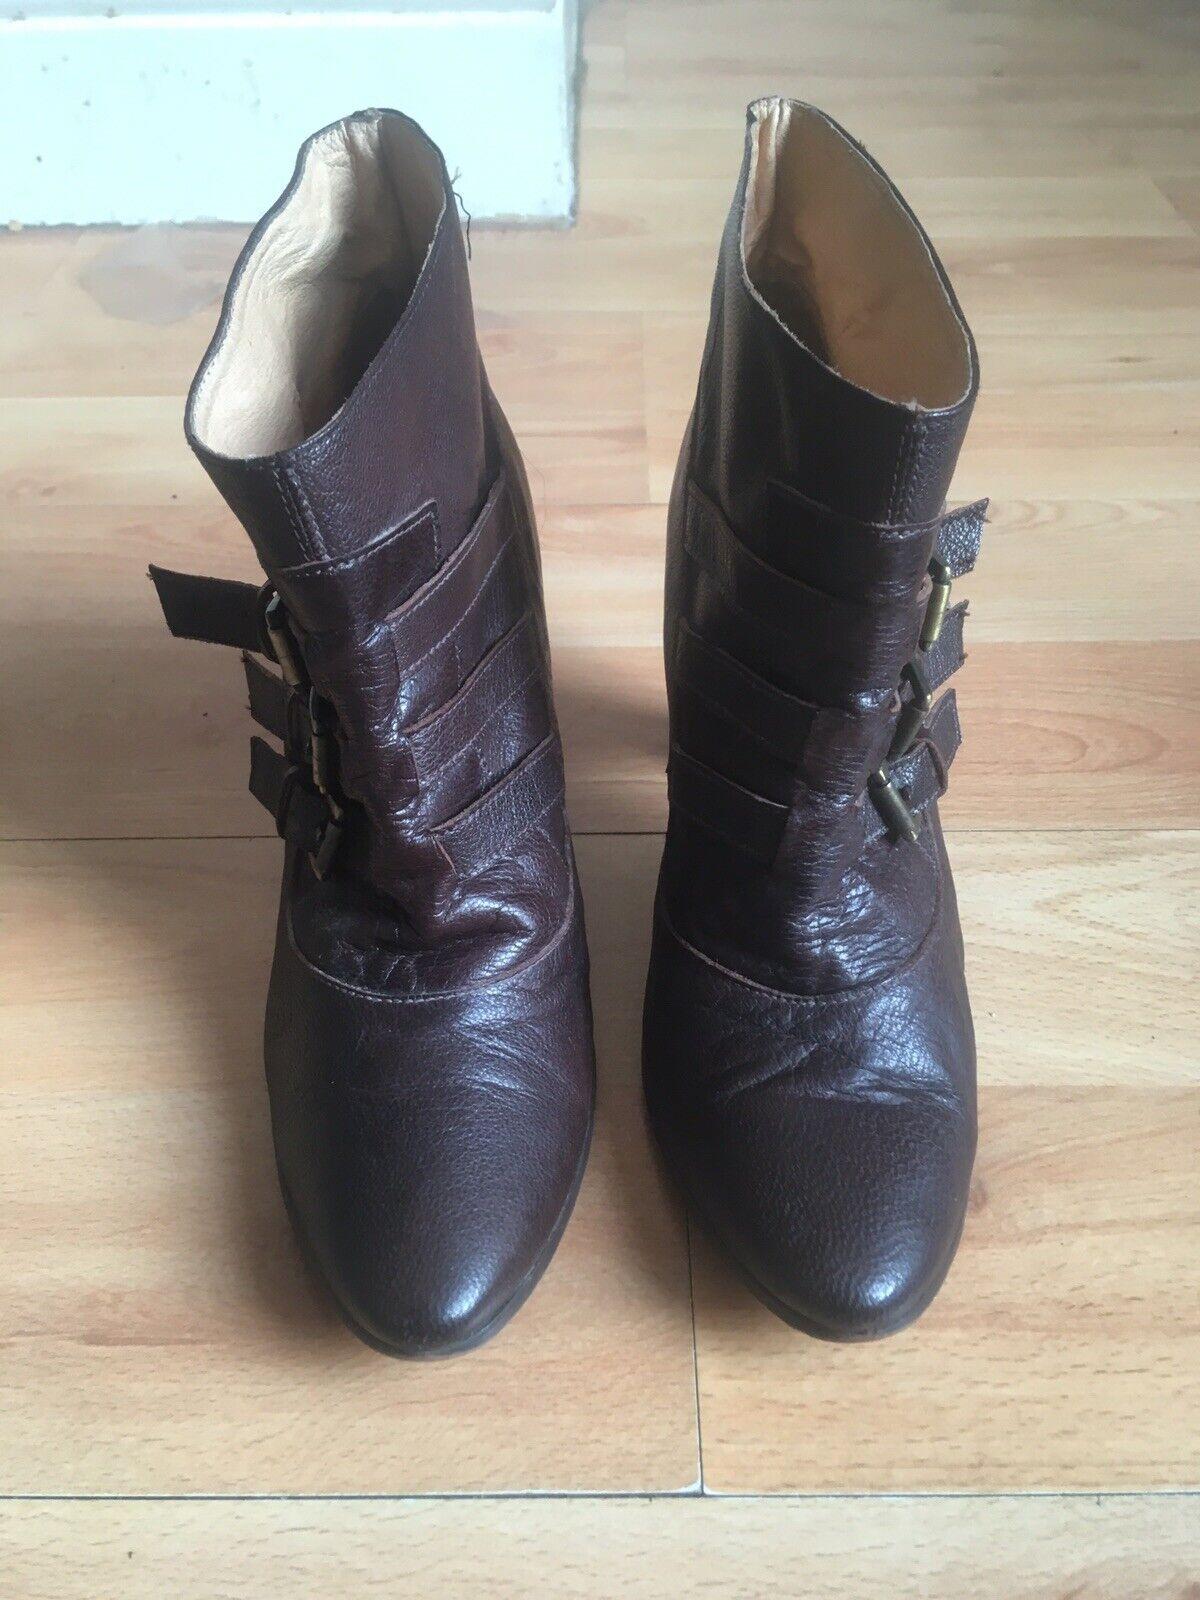 Destroy Ankle Boots Ladies U.K. 5